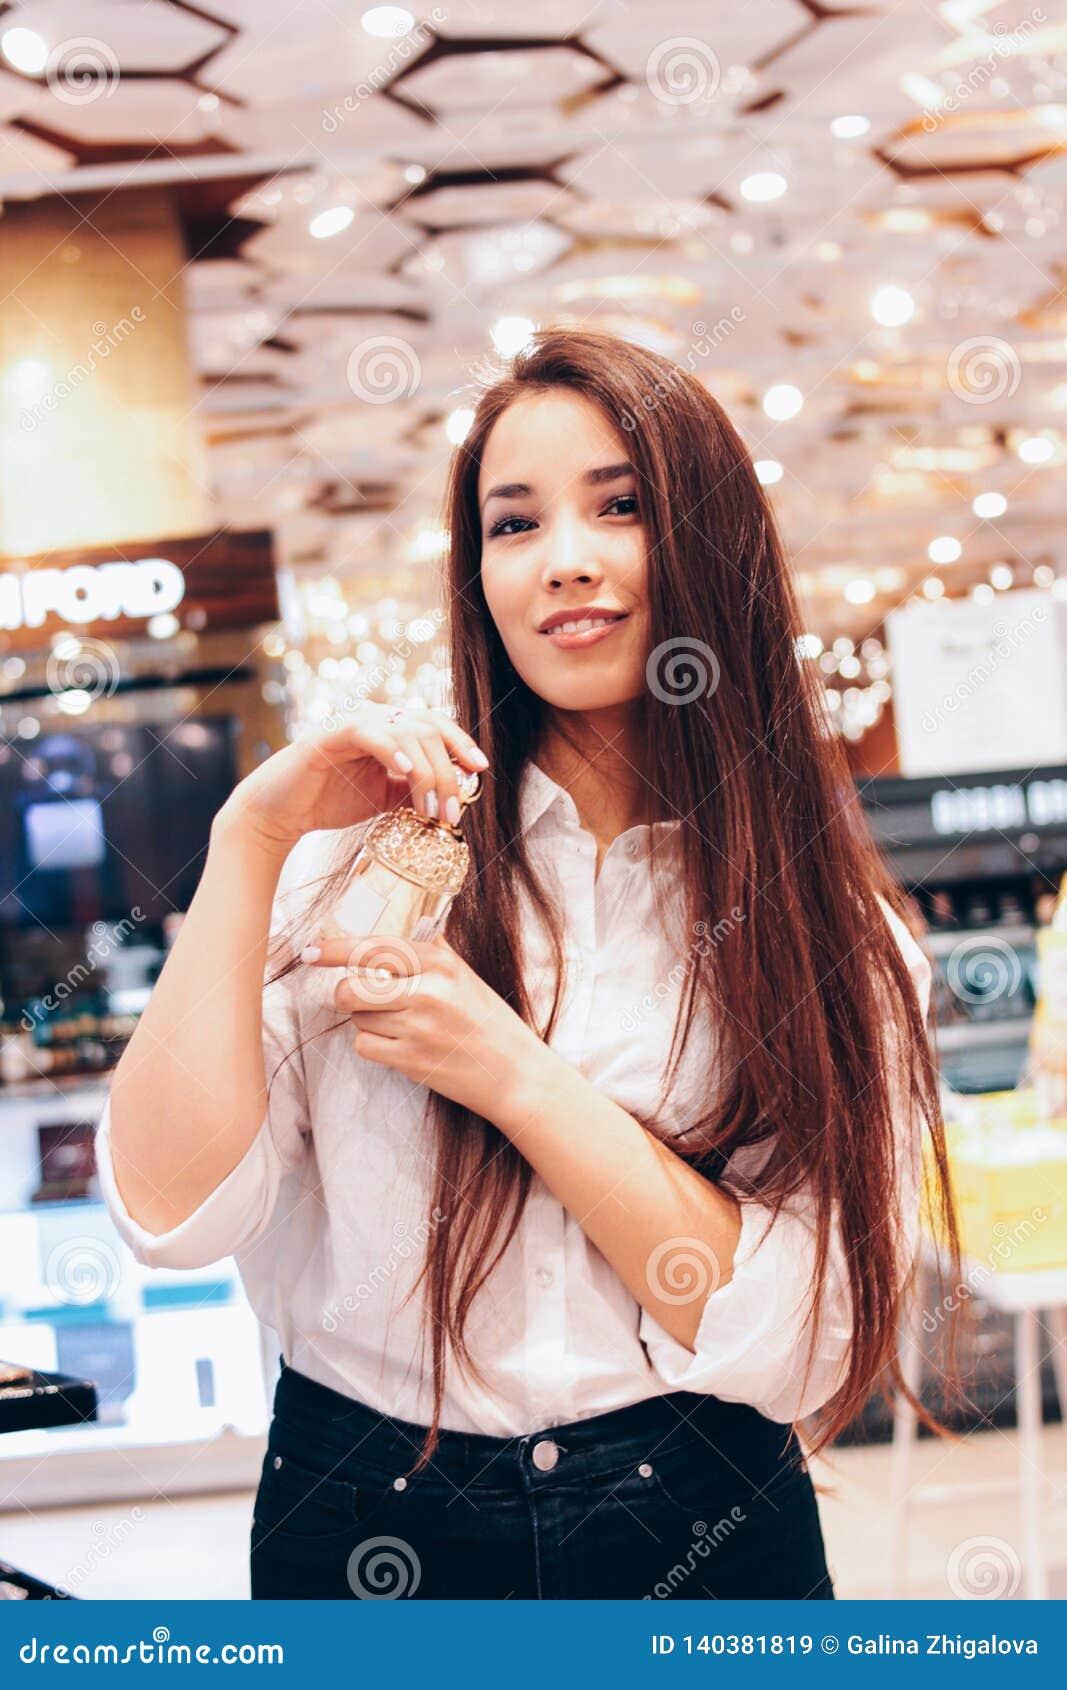 beautiful long hair asian smiling girl young woman in shop supermarket of cosmetics, perfumes, duty free